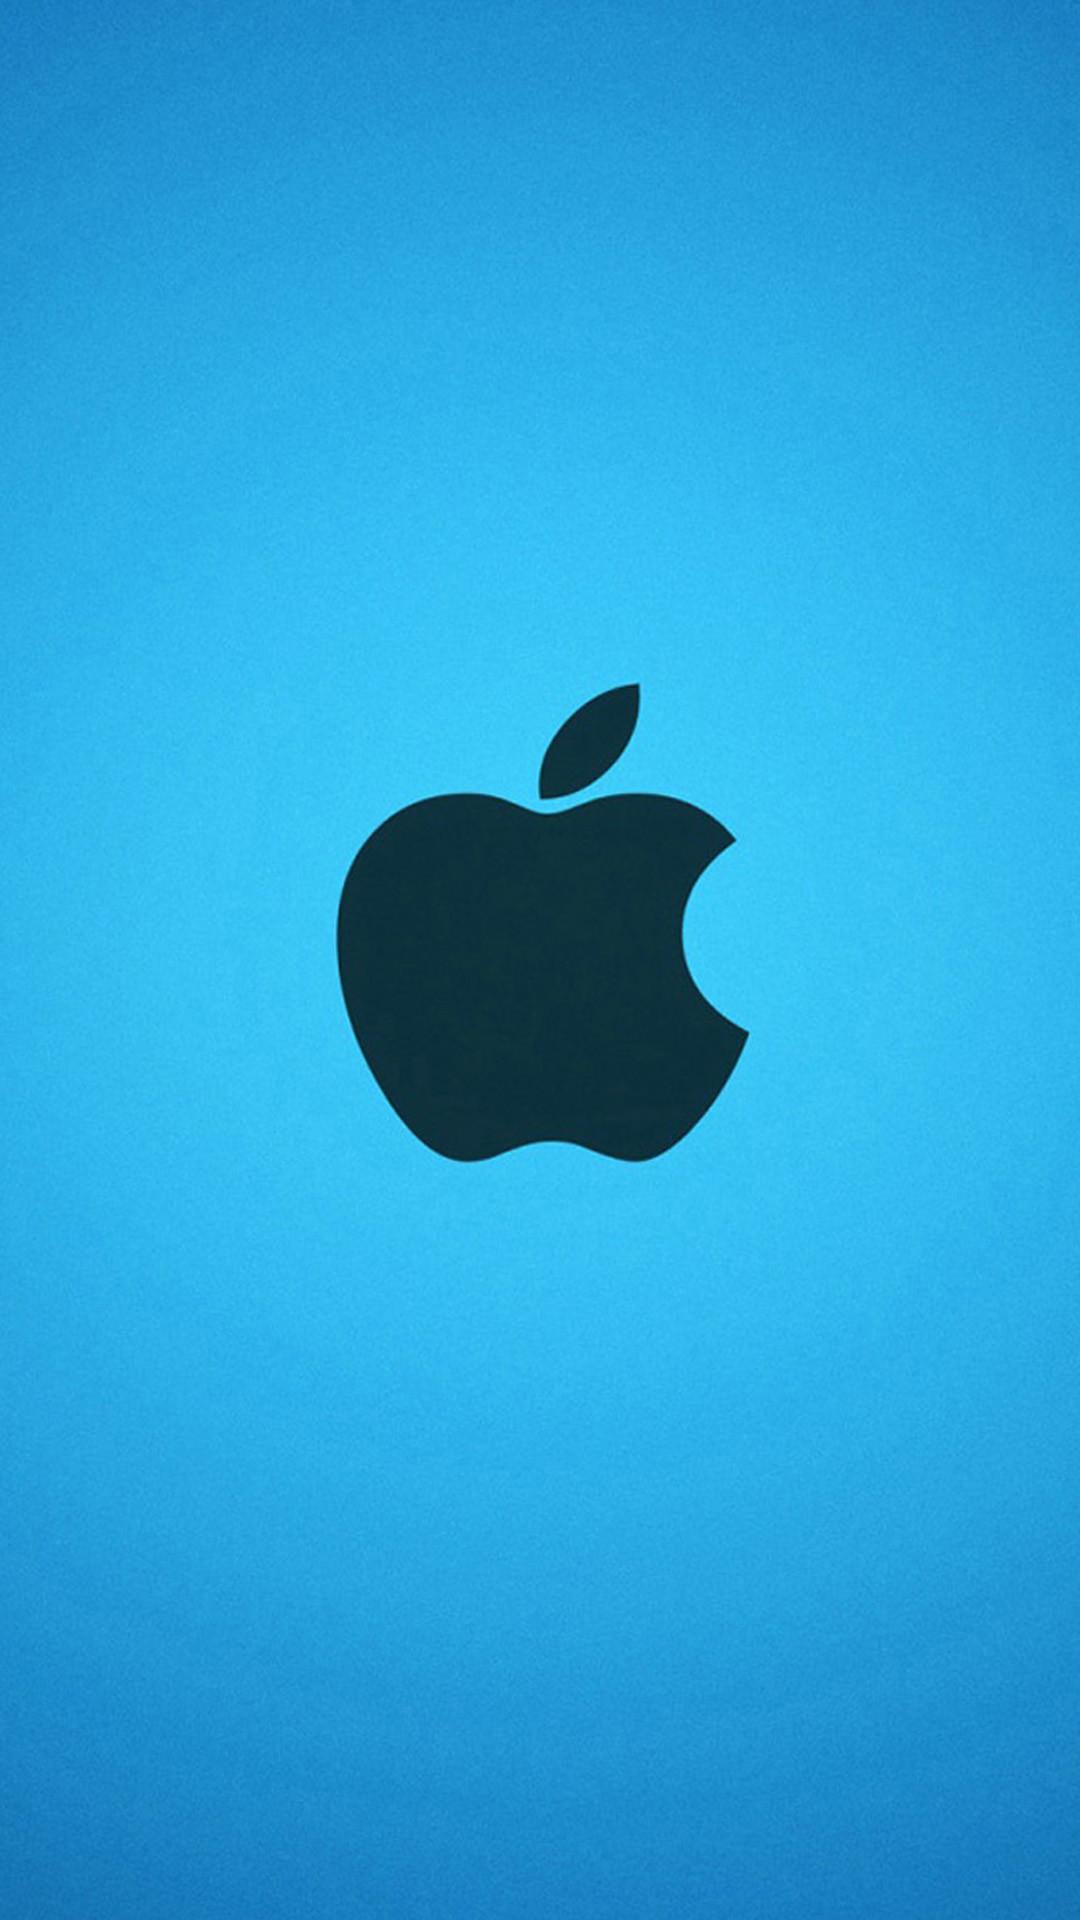 Apple iPhone 6 Plus Wallpaper 470   iPhone 6 Plus Wallpapers HD